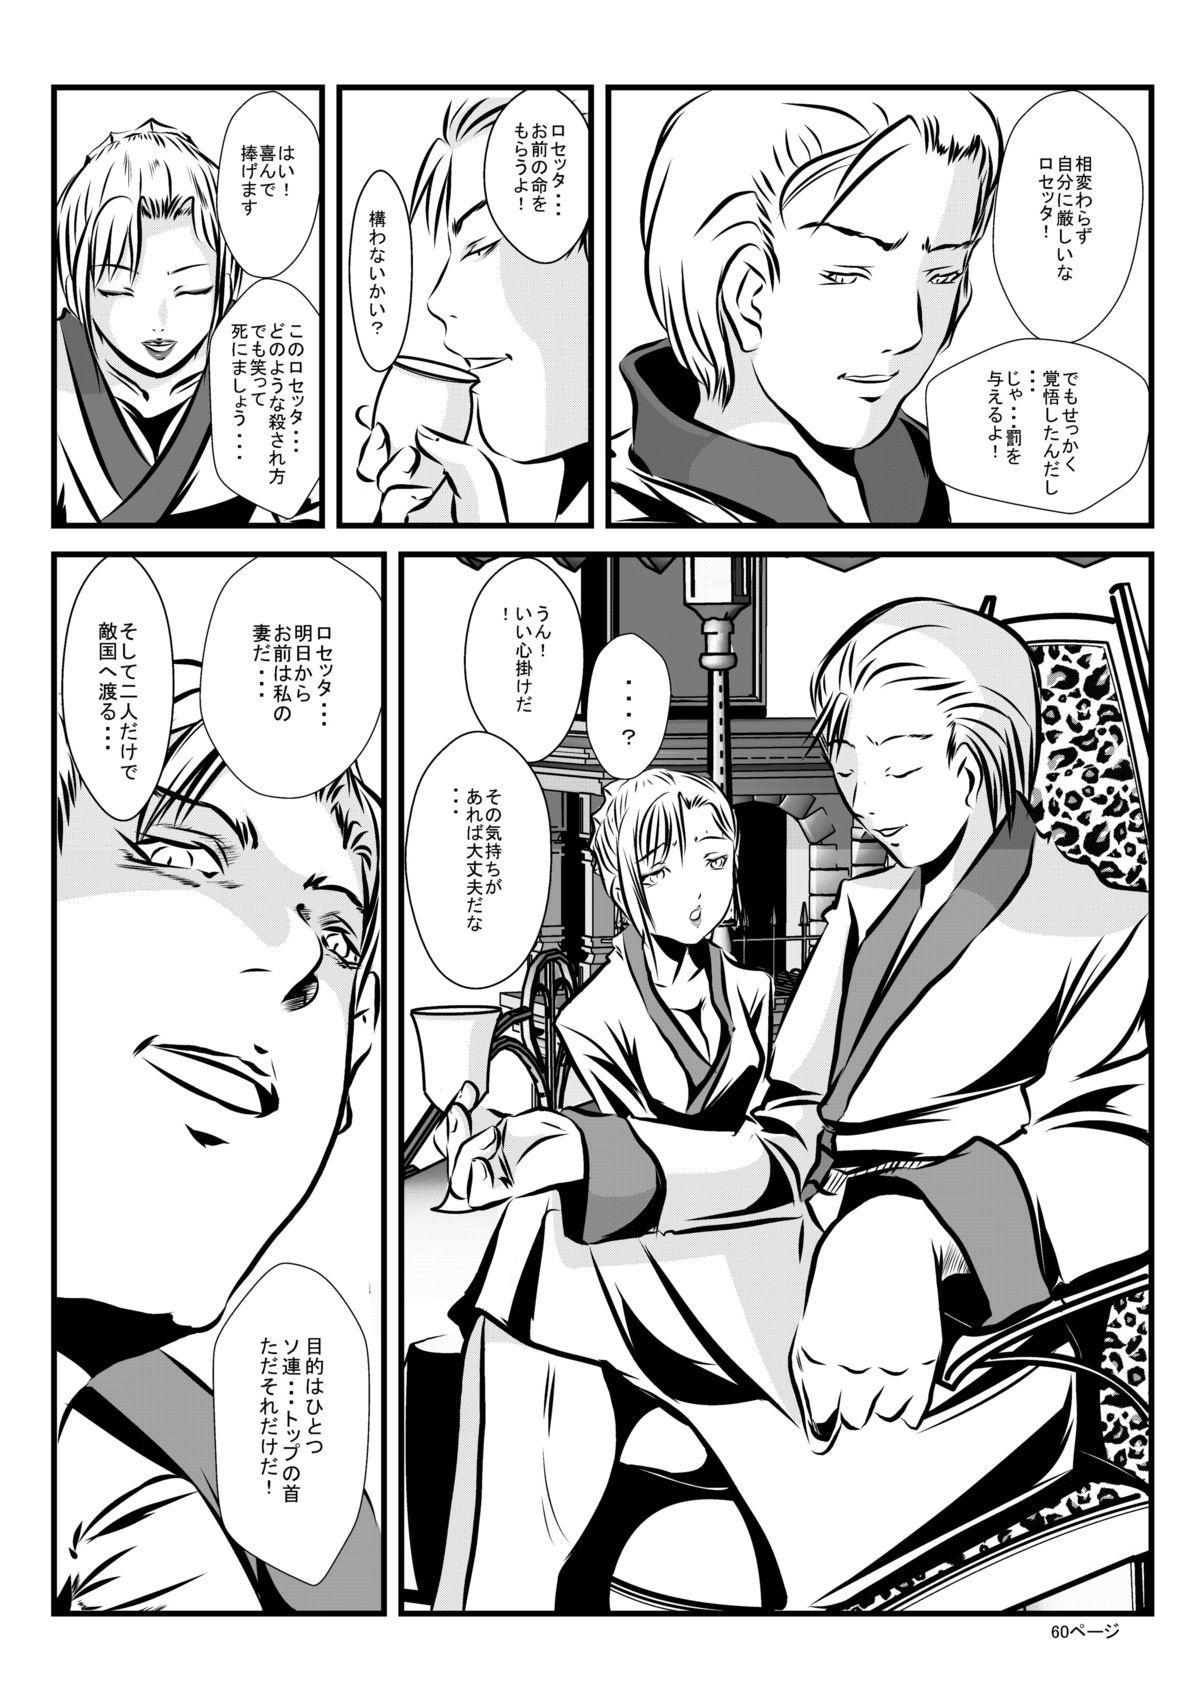 Loli Type no Jikkensitsu 58